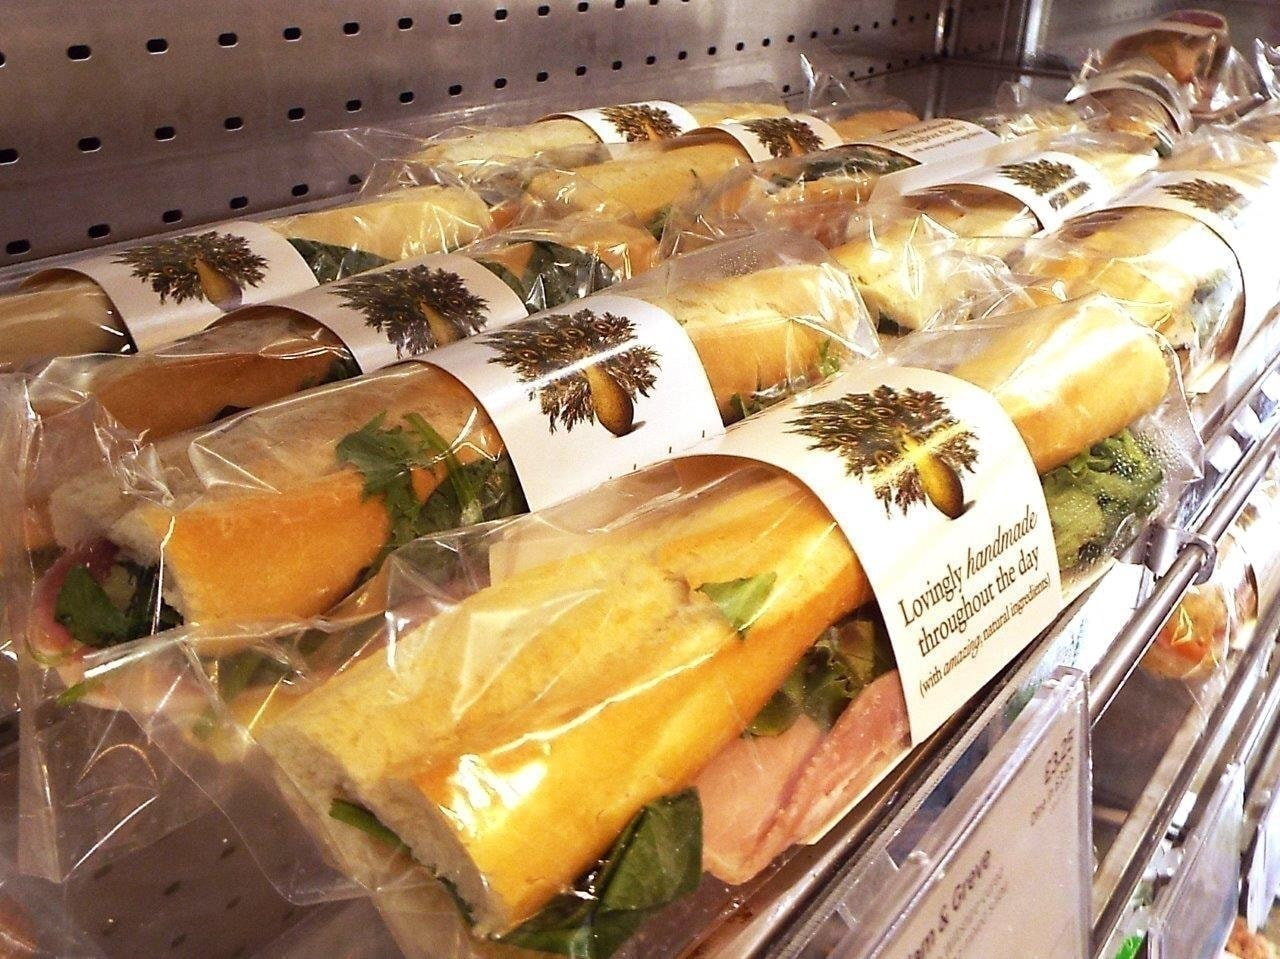 Pret - Jambon beurre mini baguette